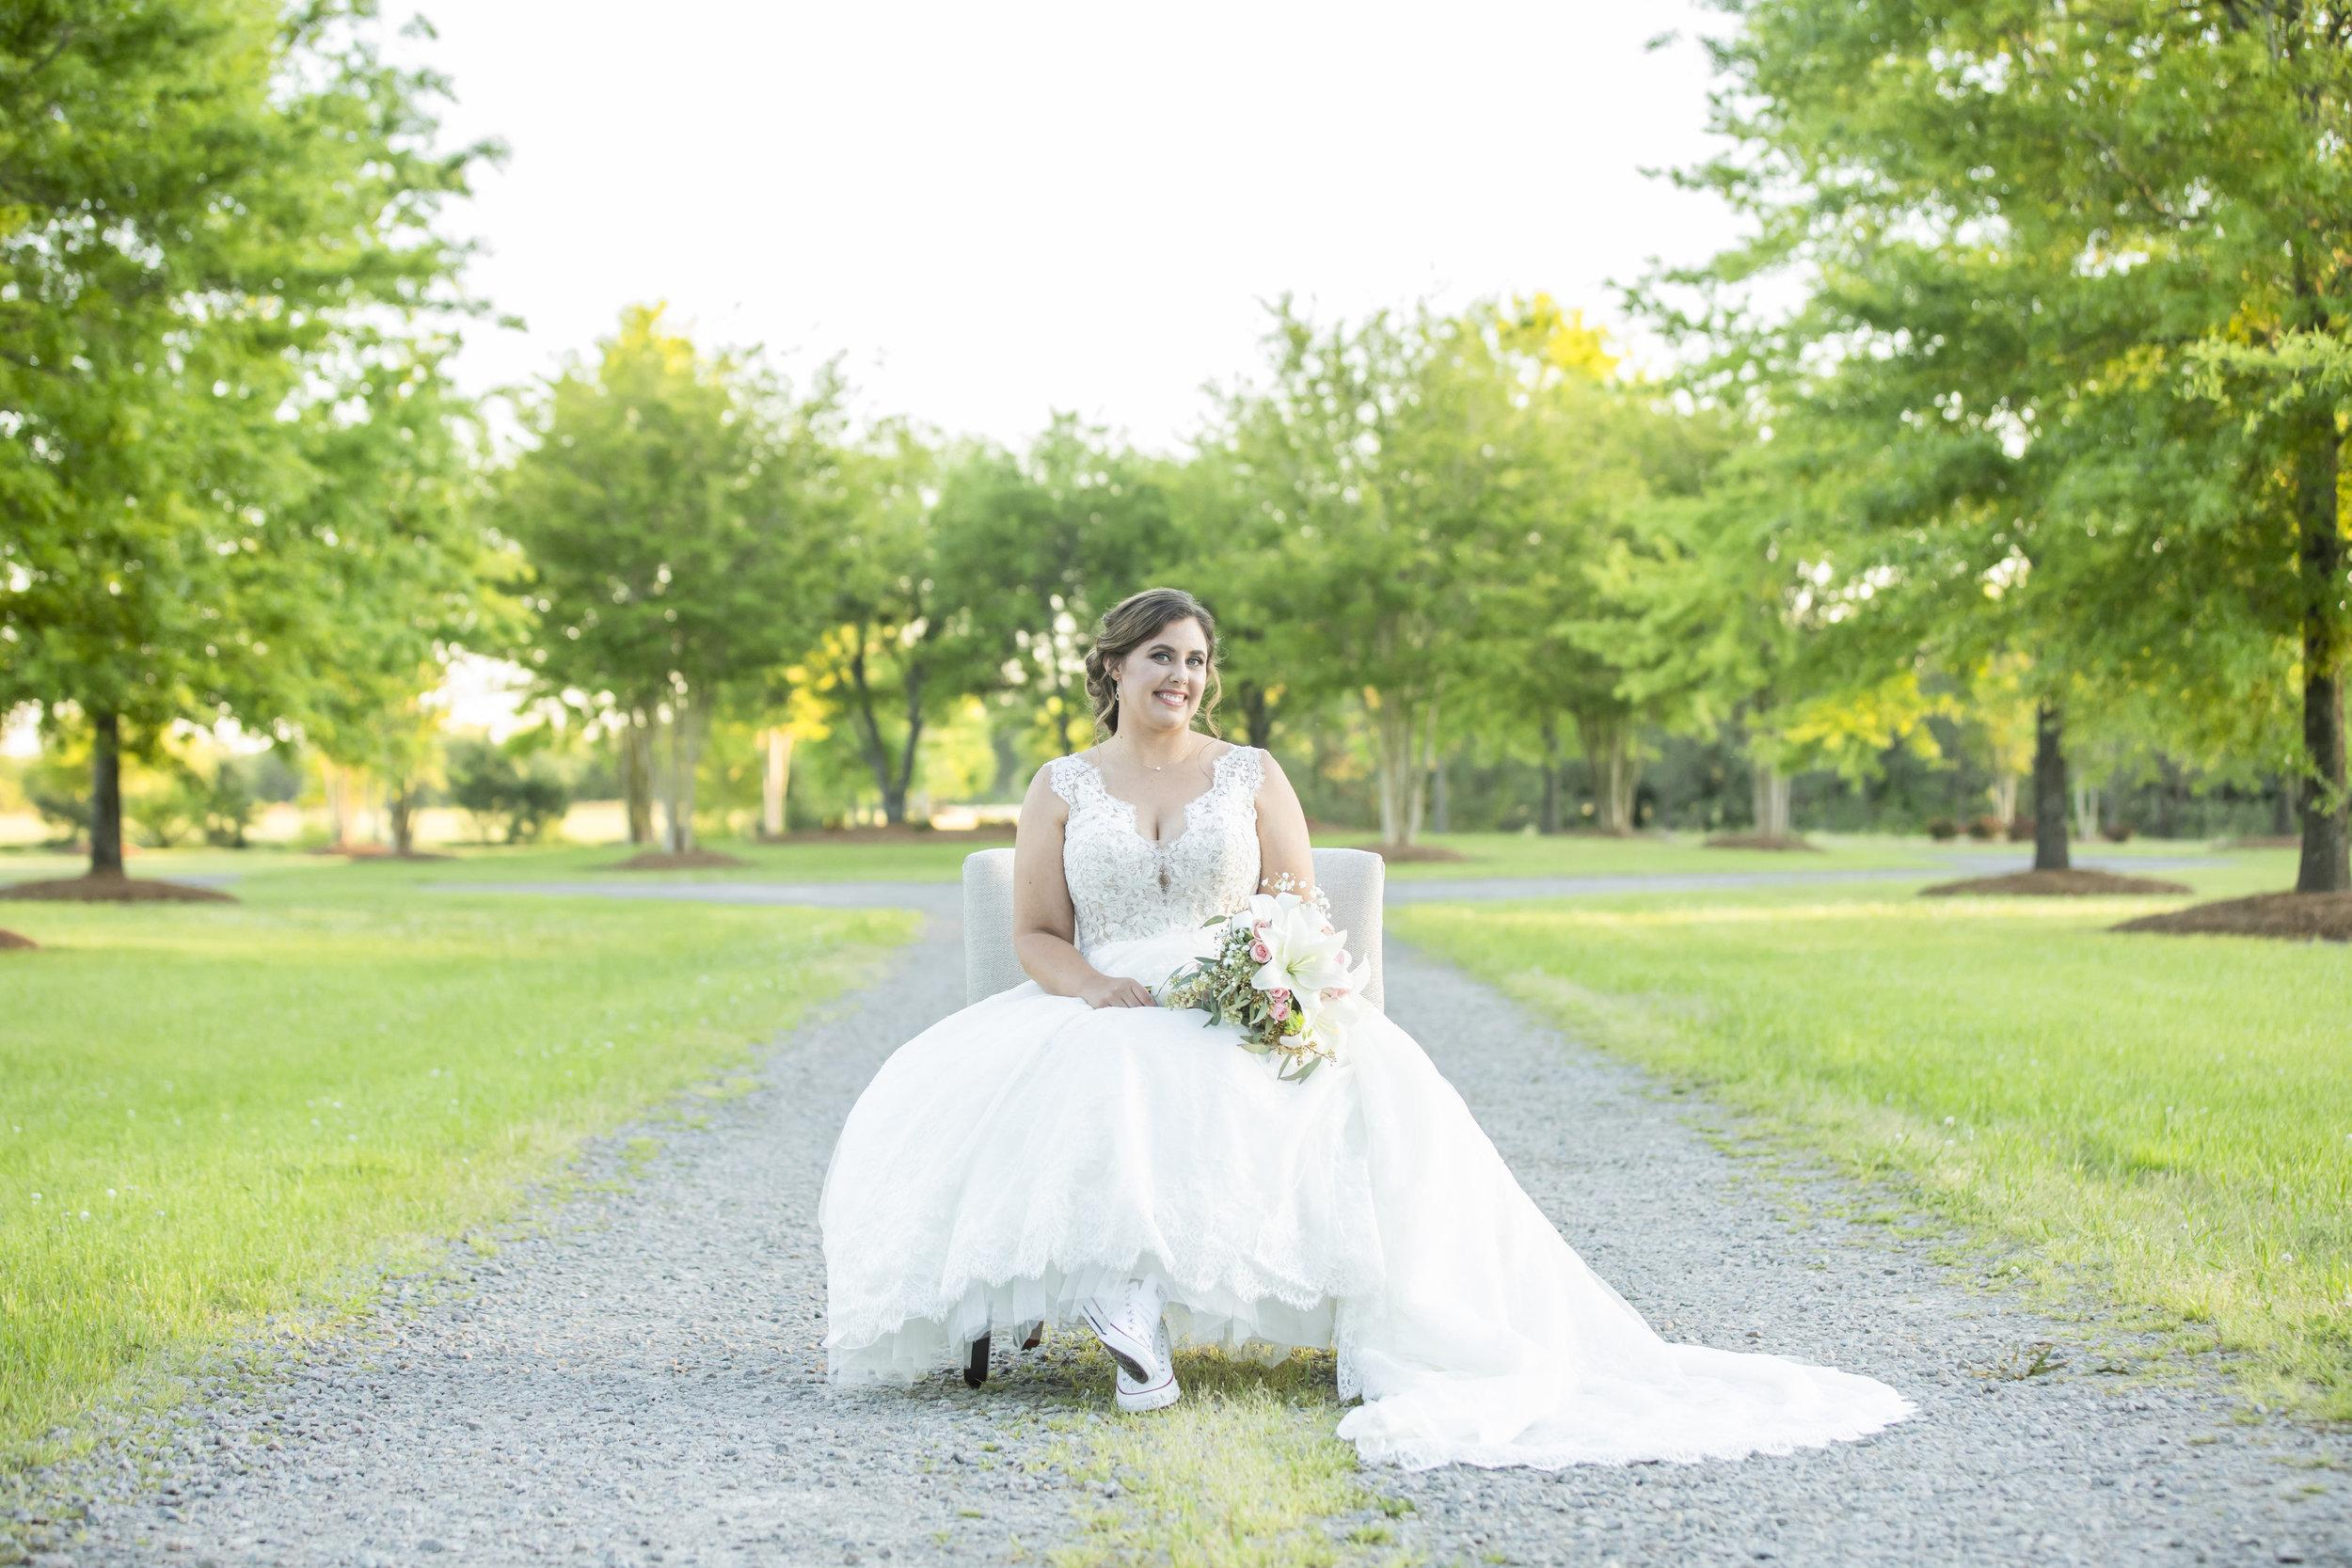 Bridal-Bridal-0088.jpg